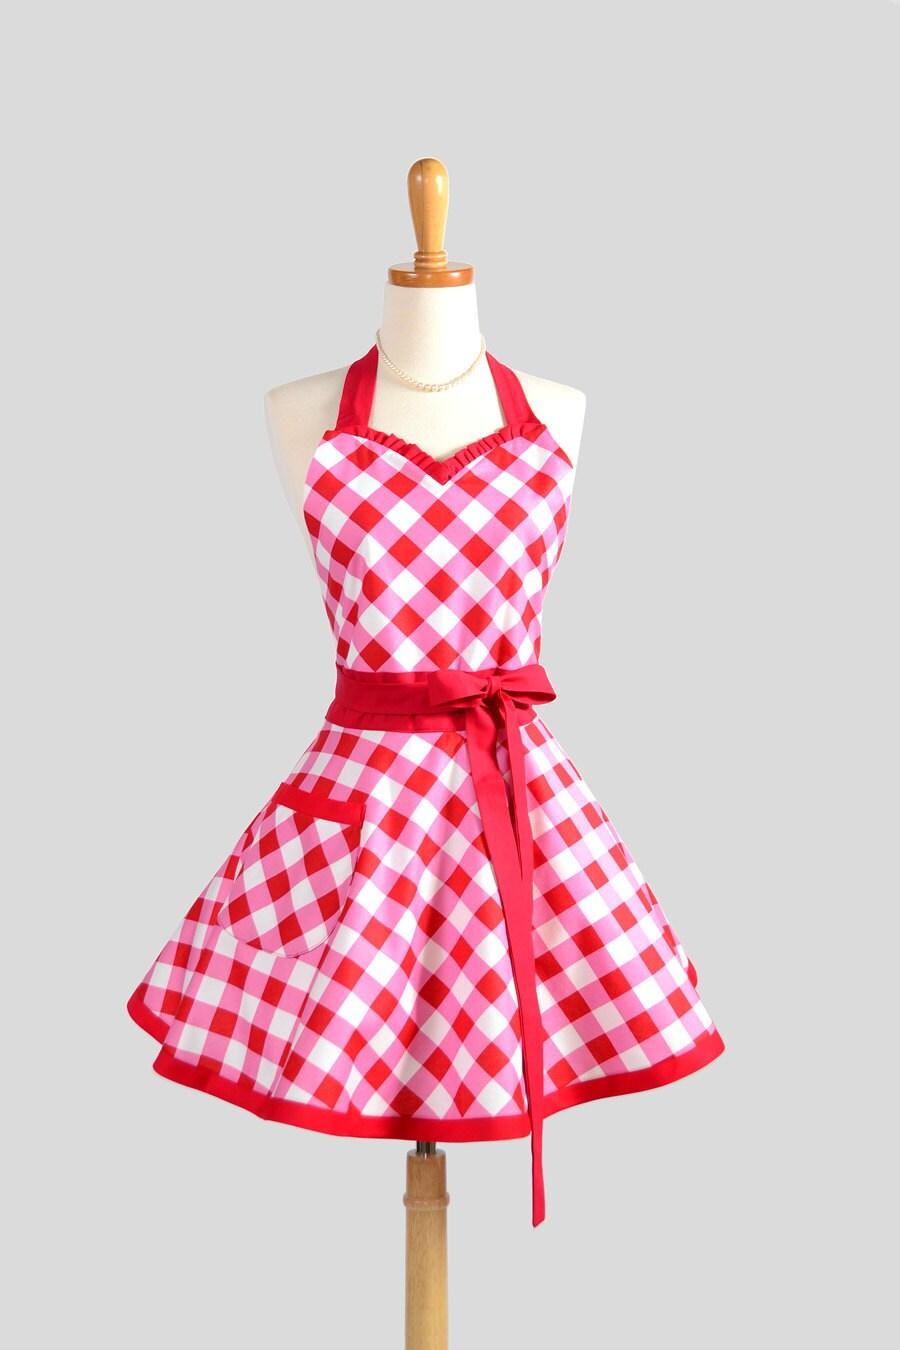 sweetheart retro apron cute kitchen full retro womens apron. Black Bedroom Furniture Sets. Home Design Ideas